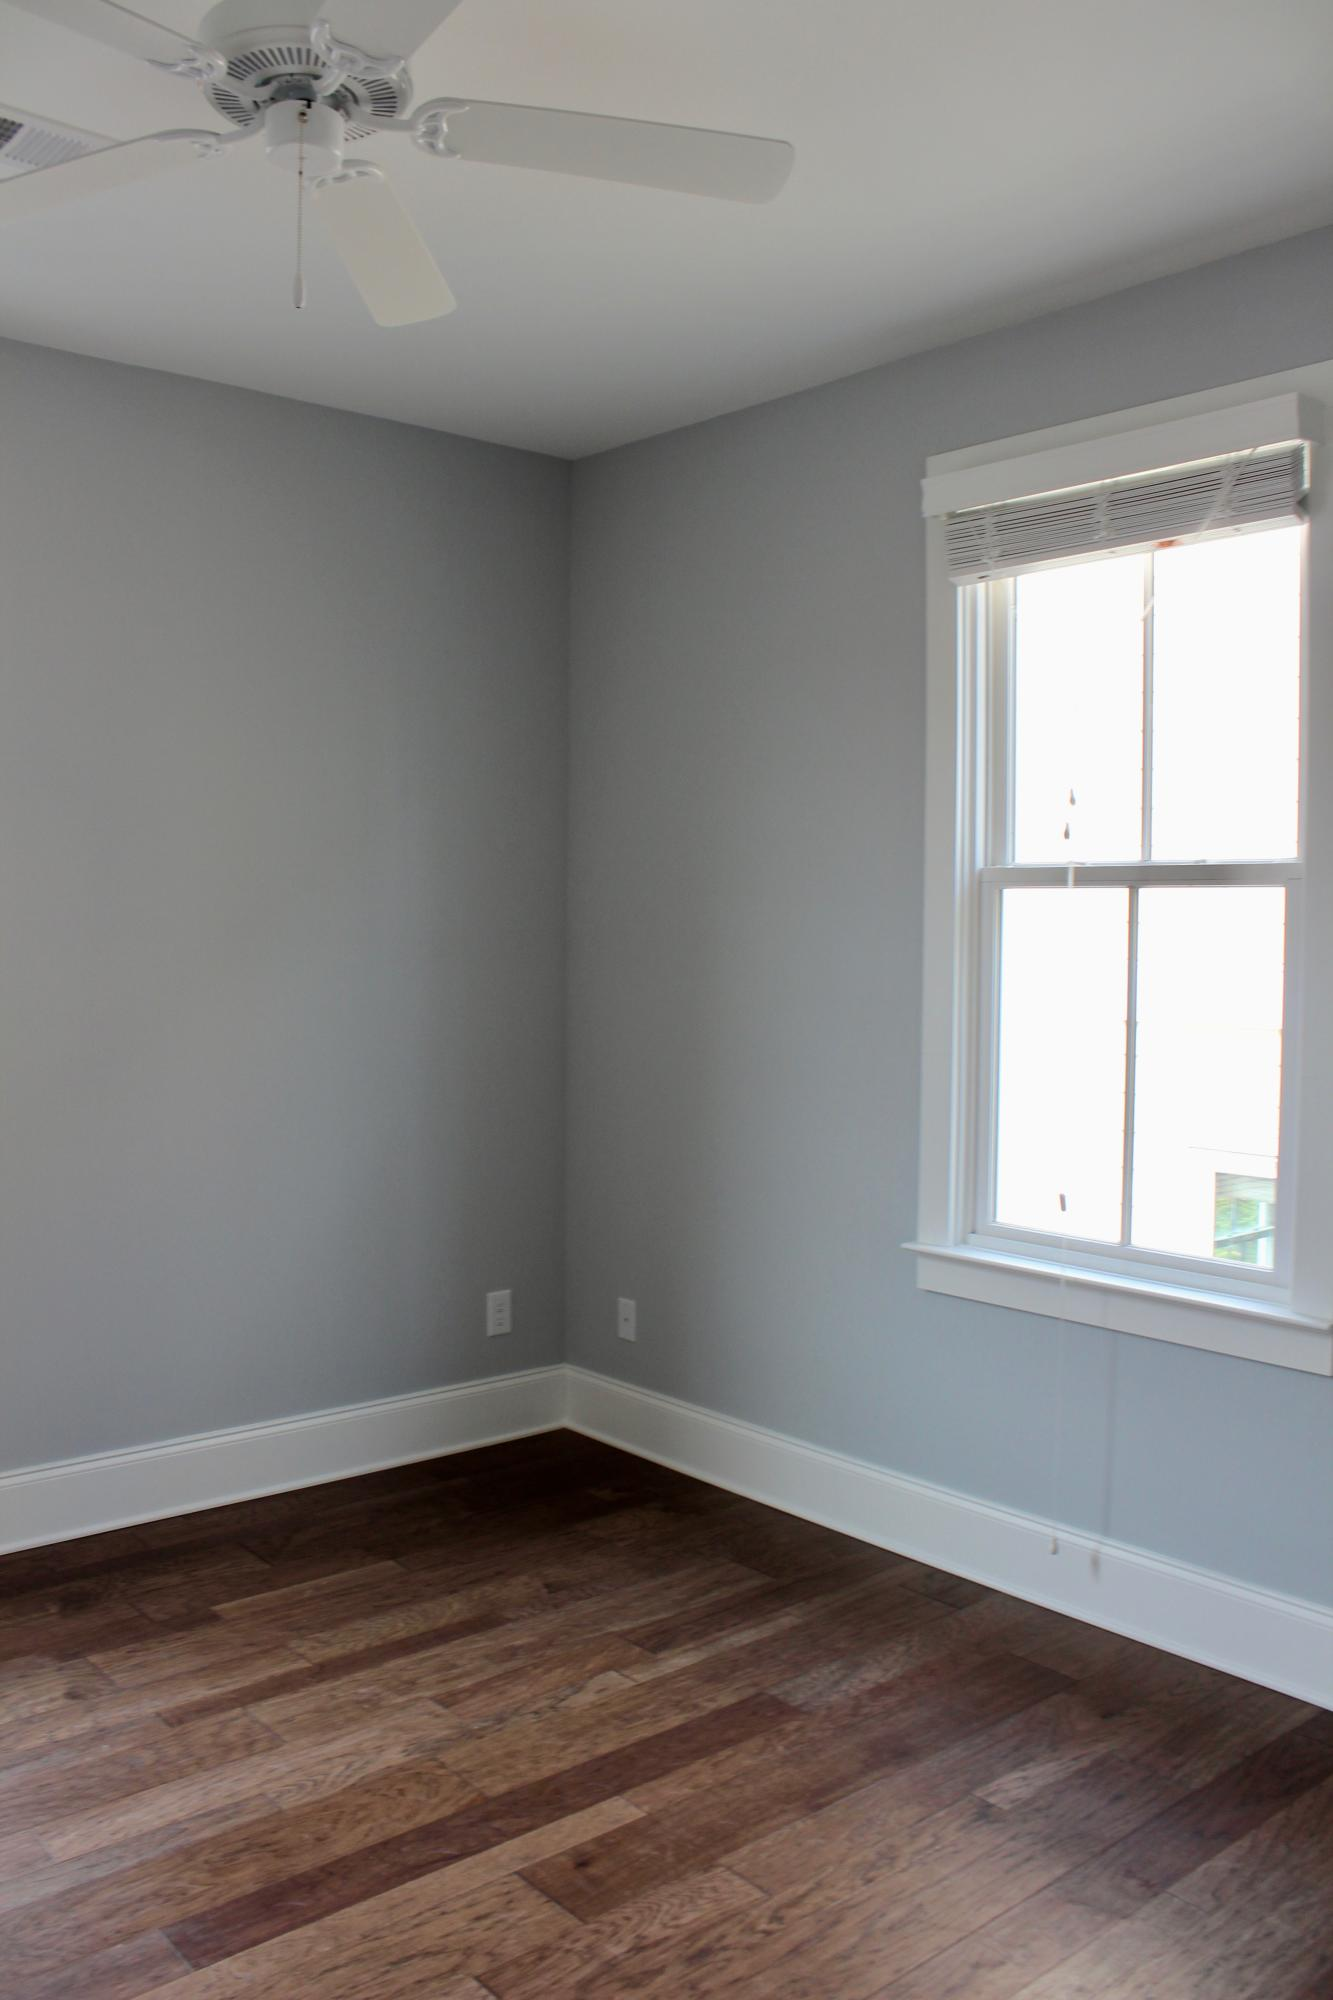 Morris Square Homes For Sale - 46 Dereef, Charleston, SC - 24